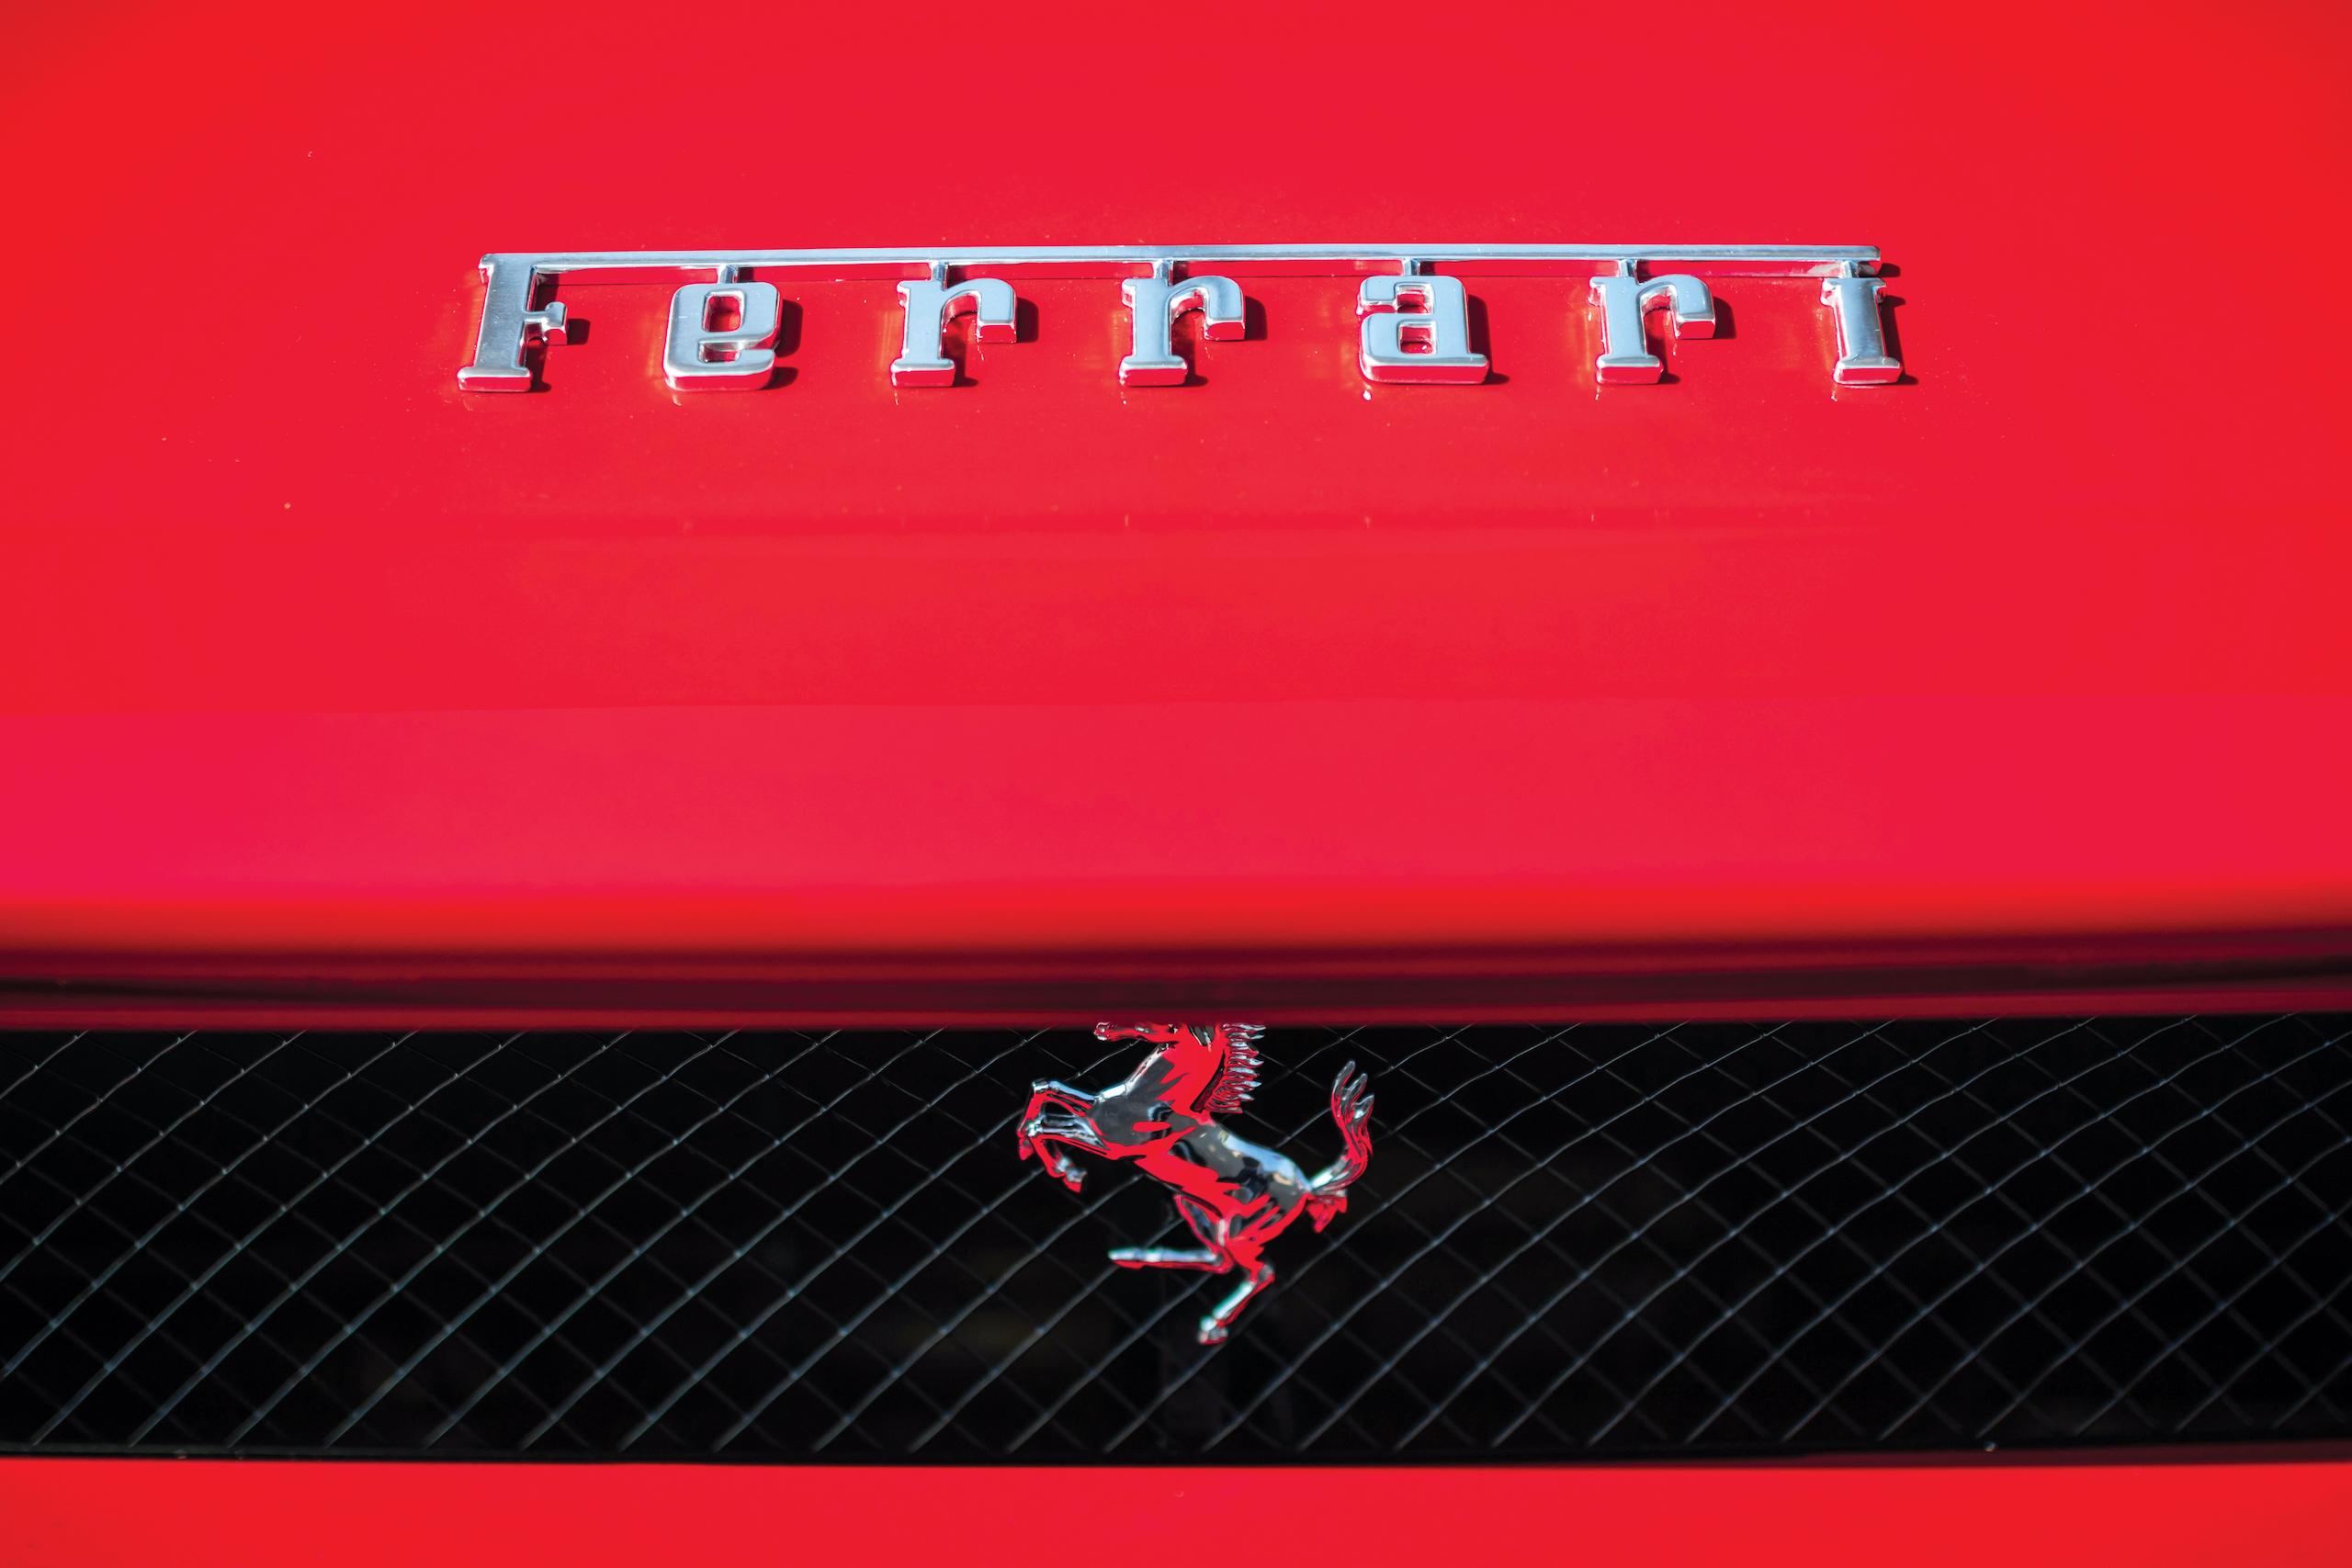 2003 Ferrari Enzo lettering and horse detail